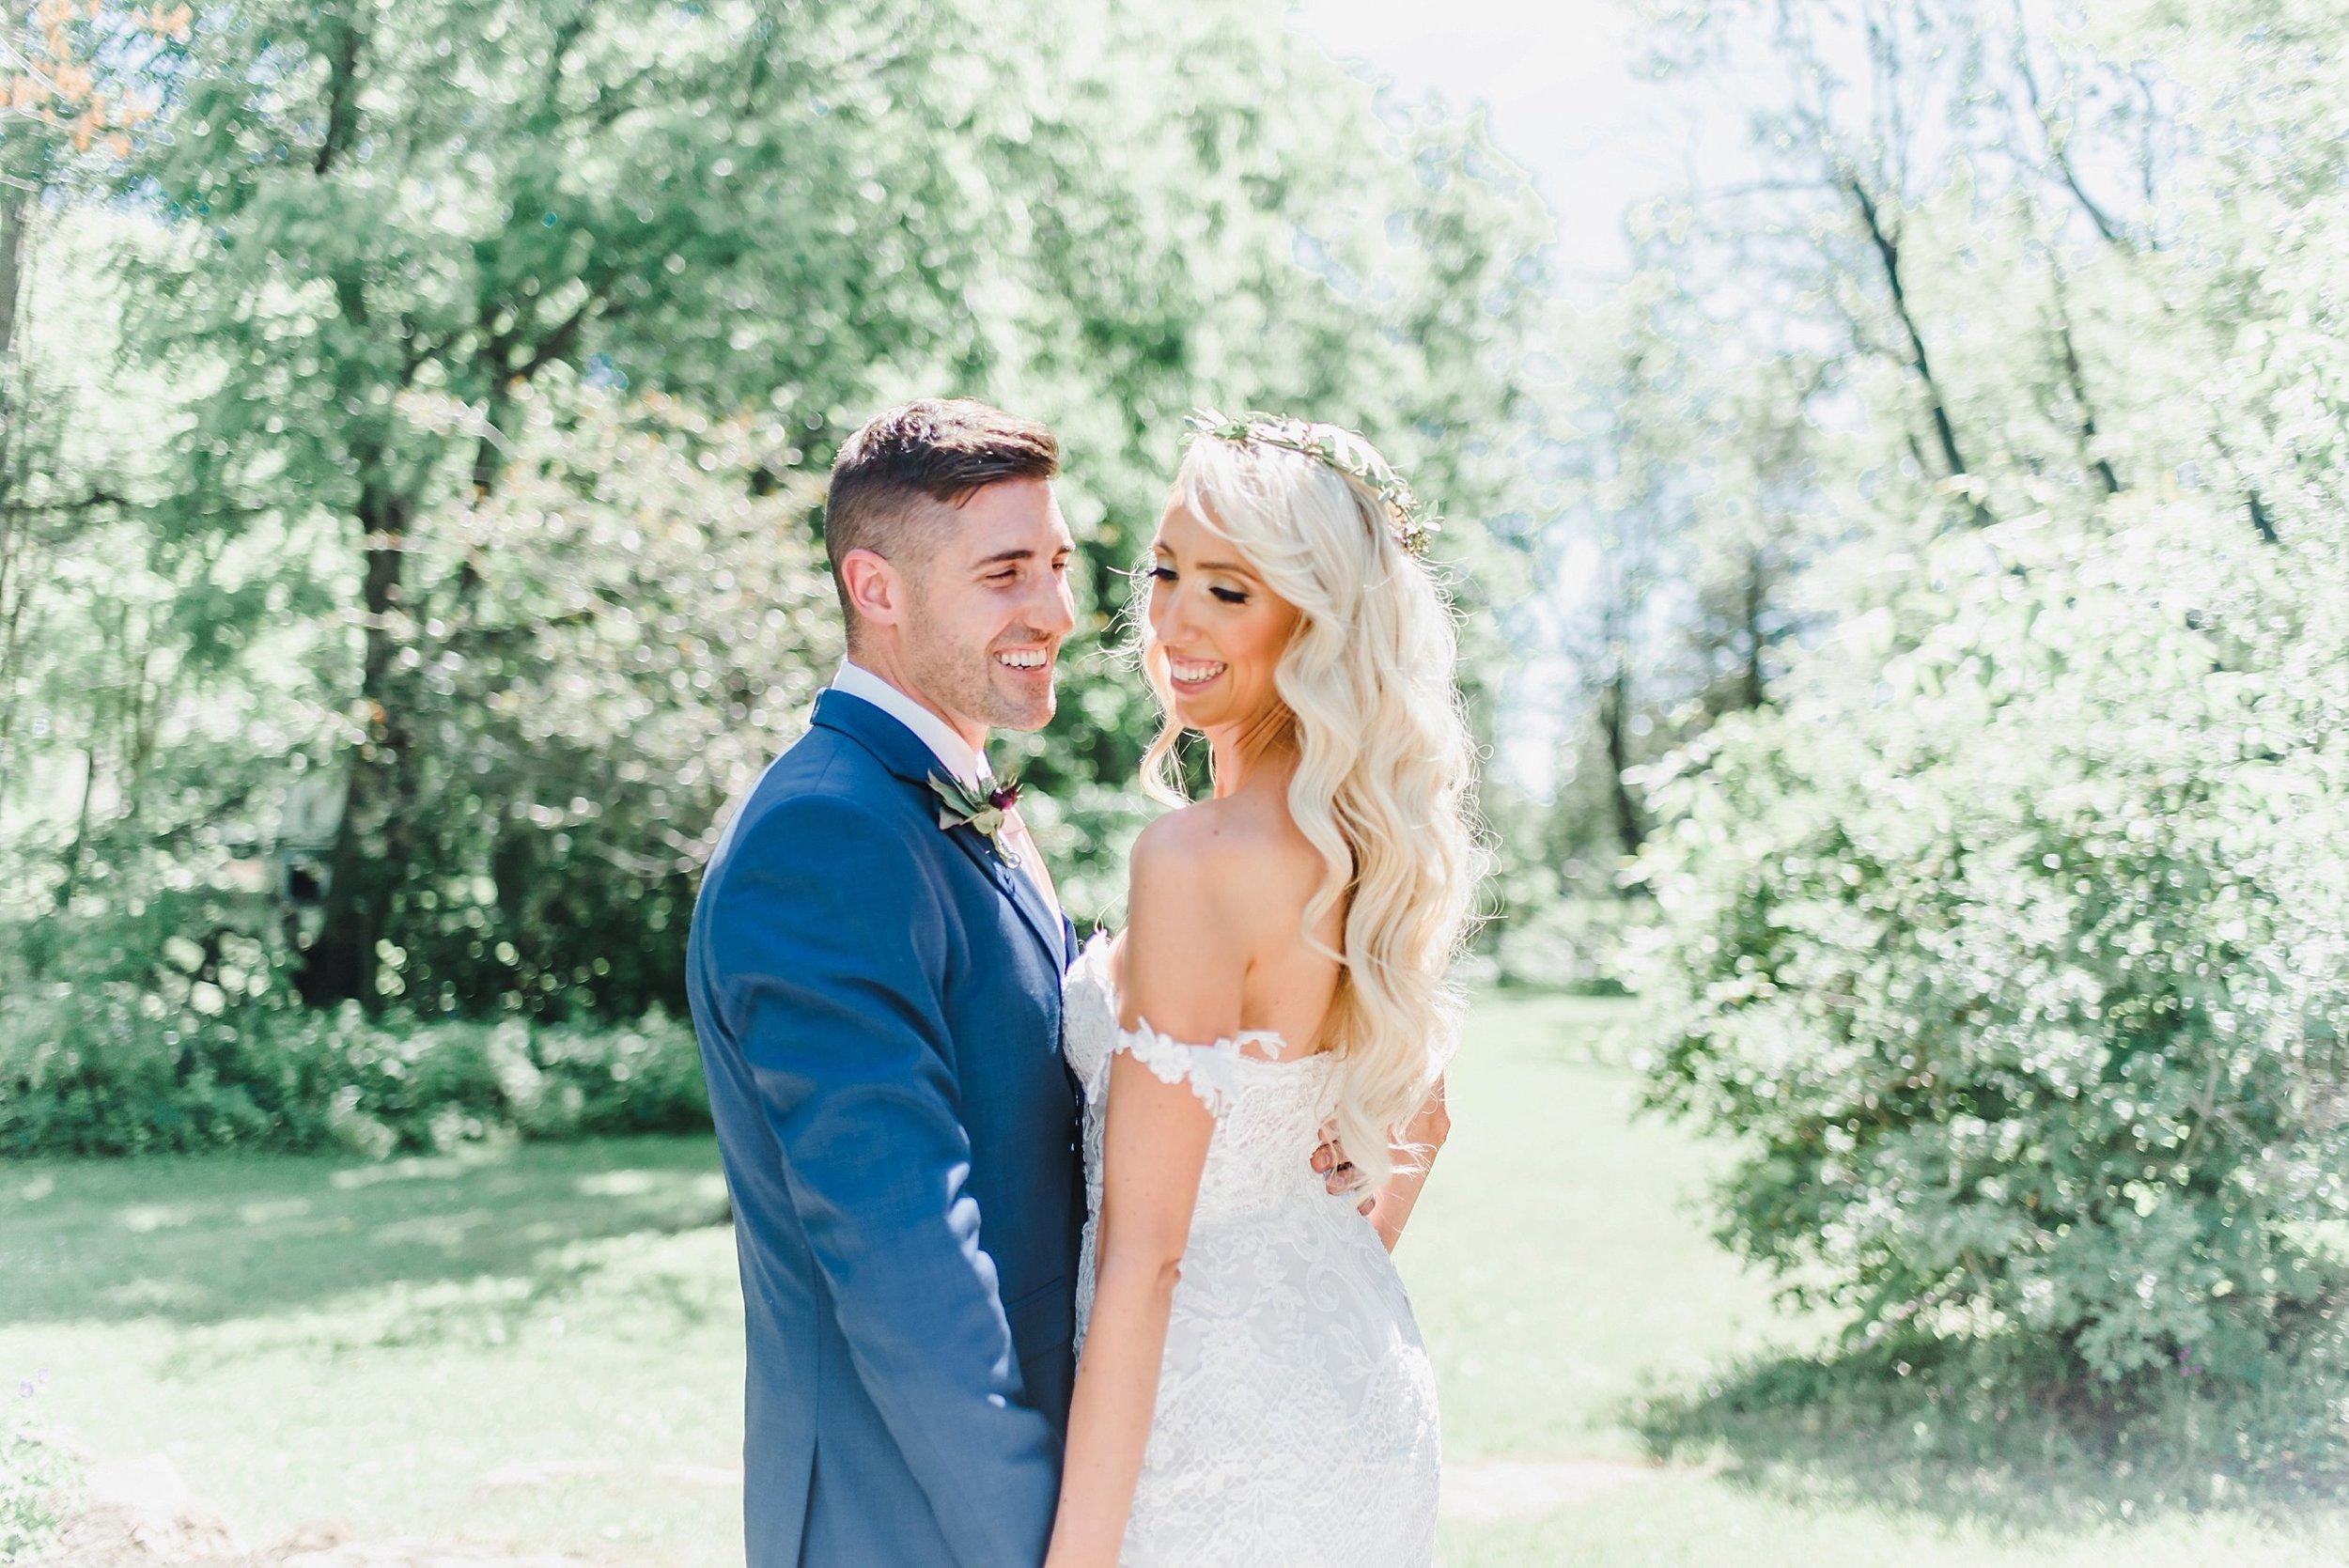 light airy indie fine art ottawa wedding photographer | Ali and Batoul Photography_0043.jpg